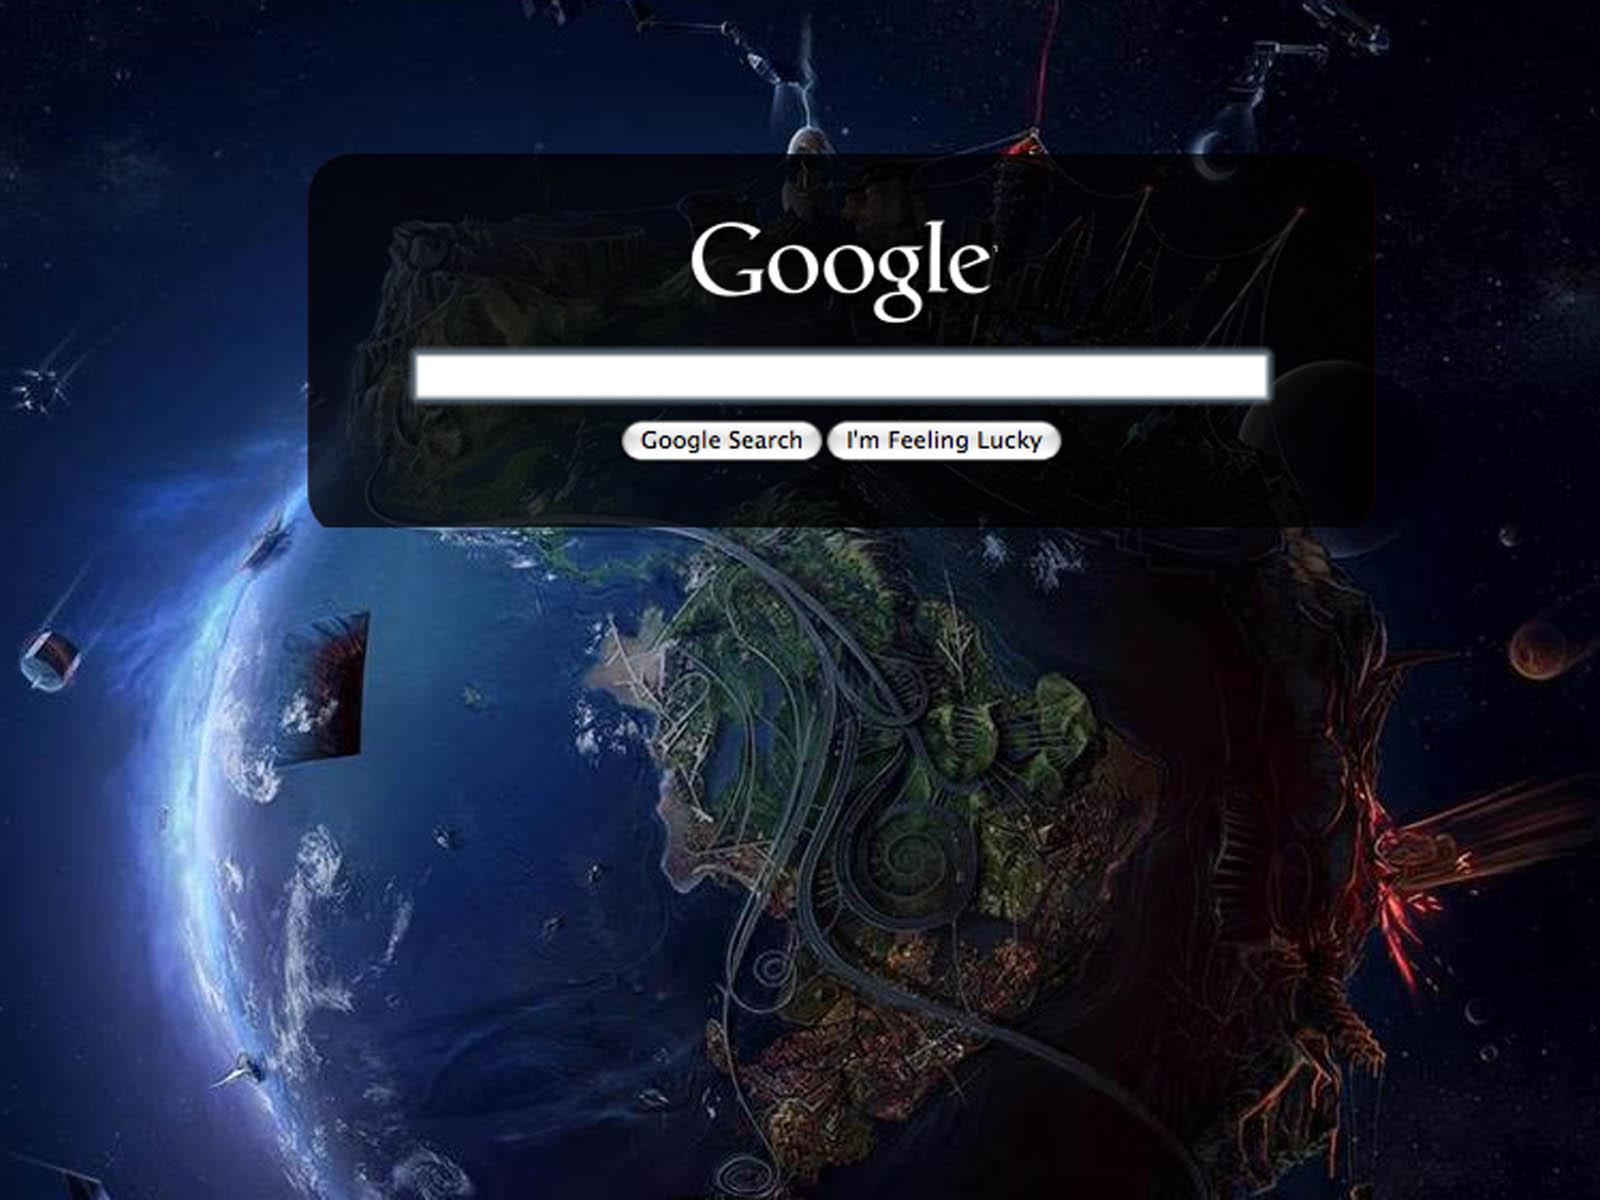 Google Desktop Wallpapers Google Desktop Backgrounds Images 1600x1200